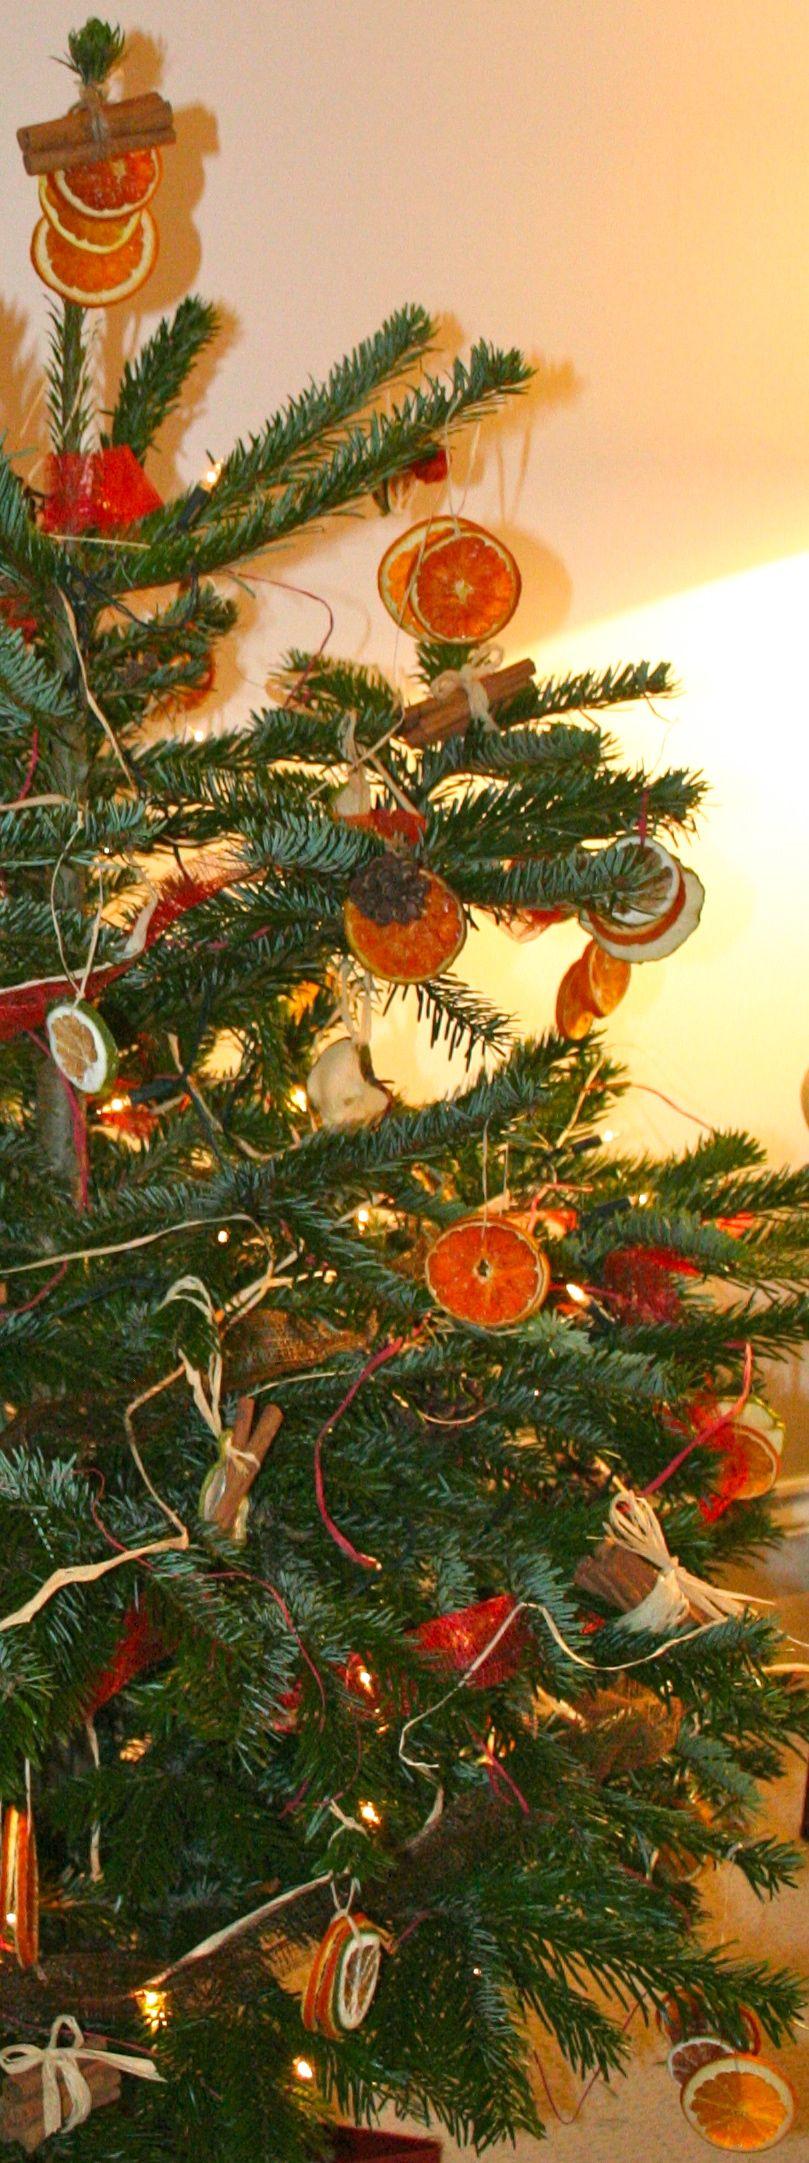 Pinterest Homemade Christmas Decoration